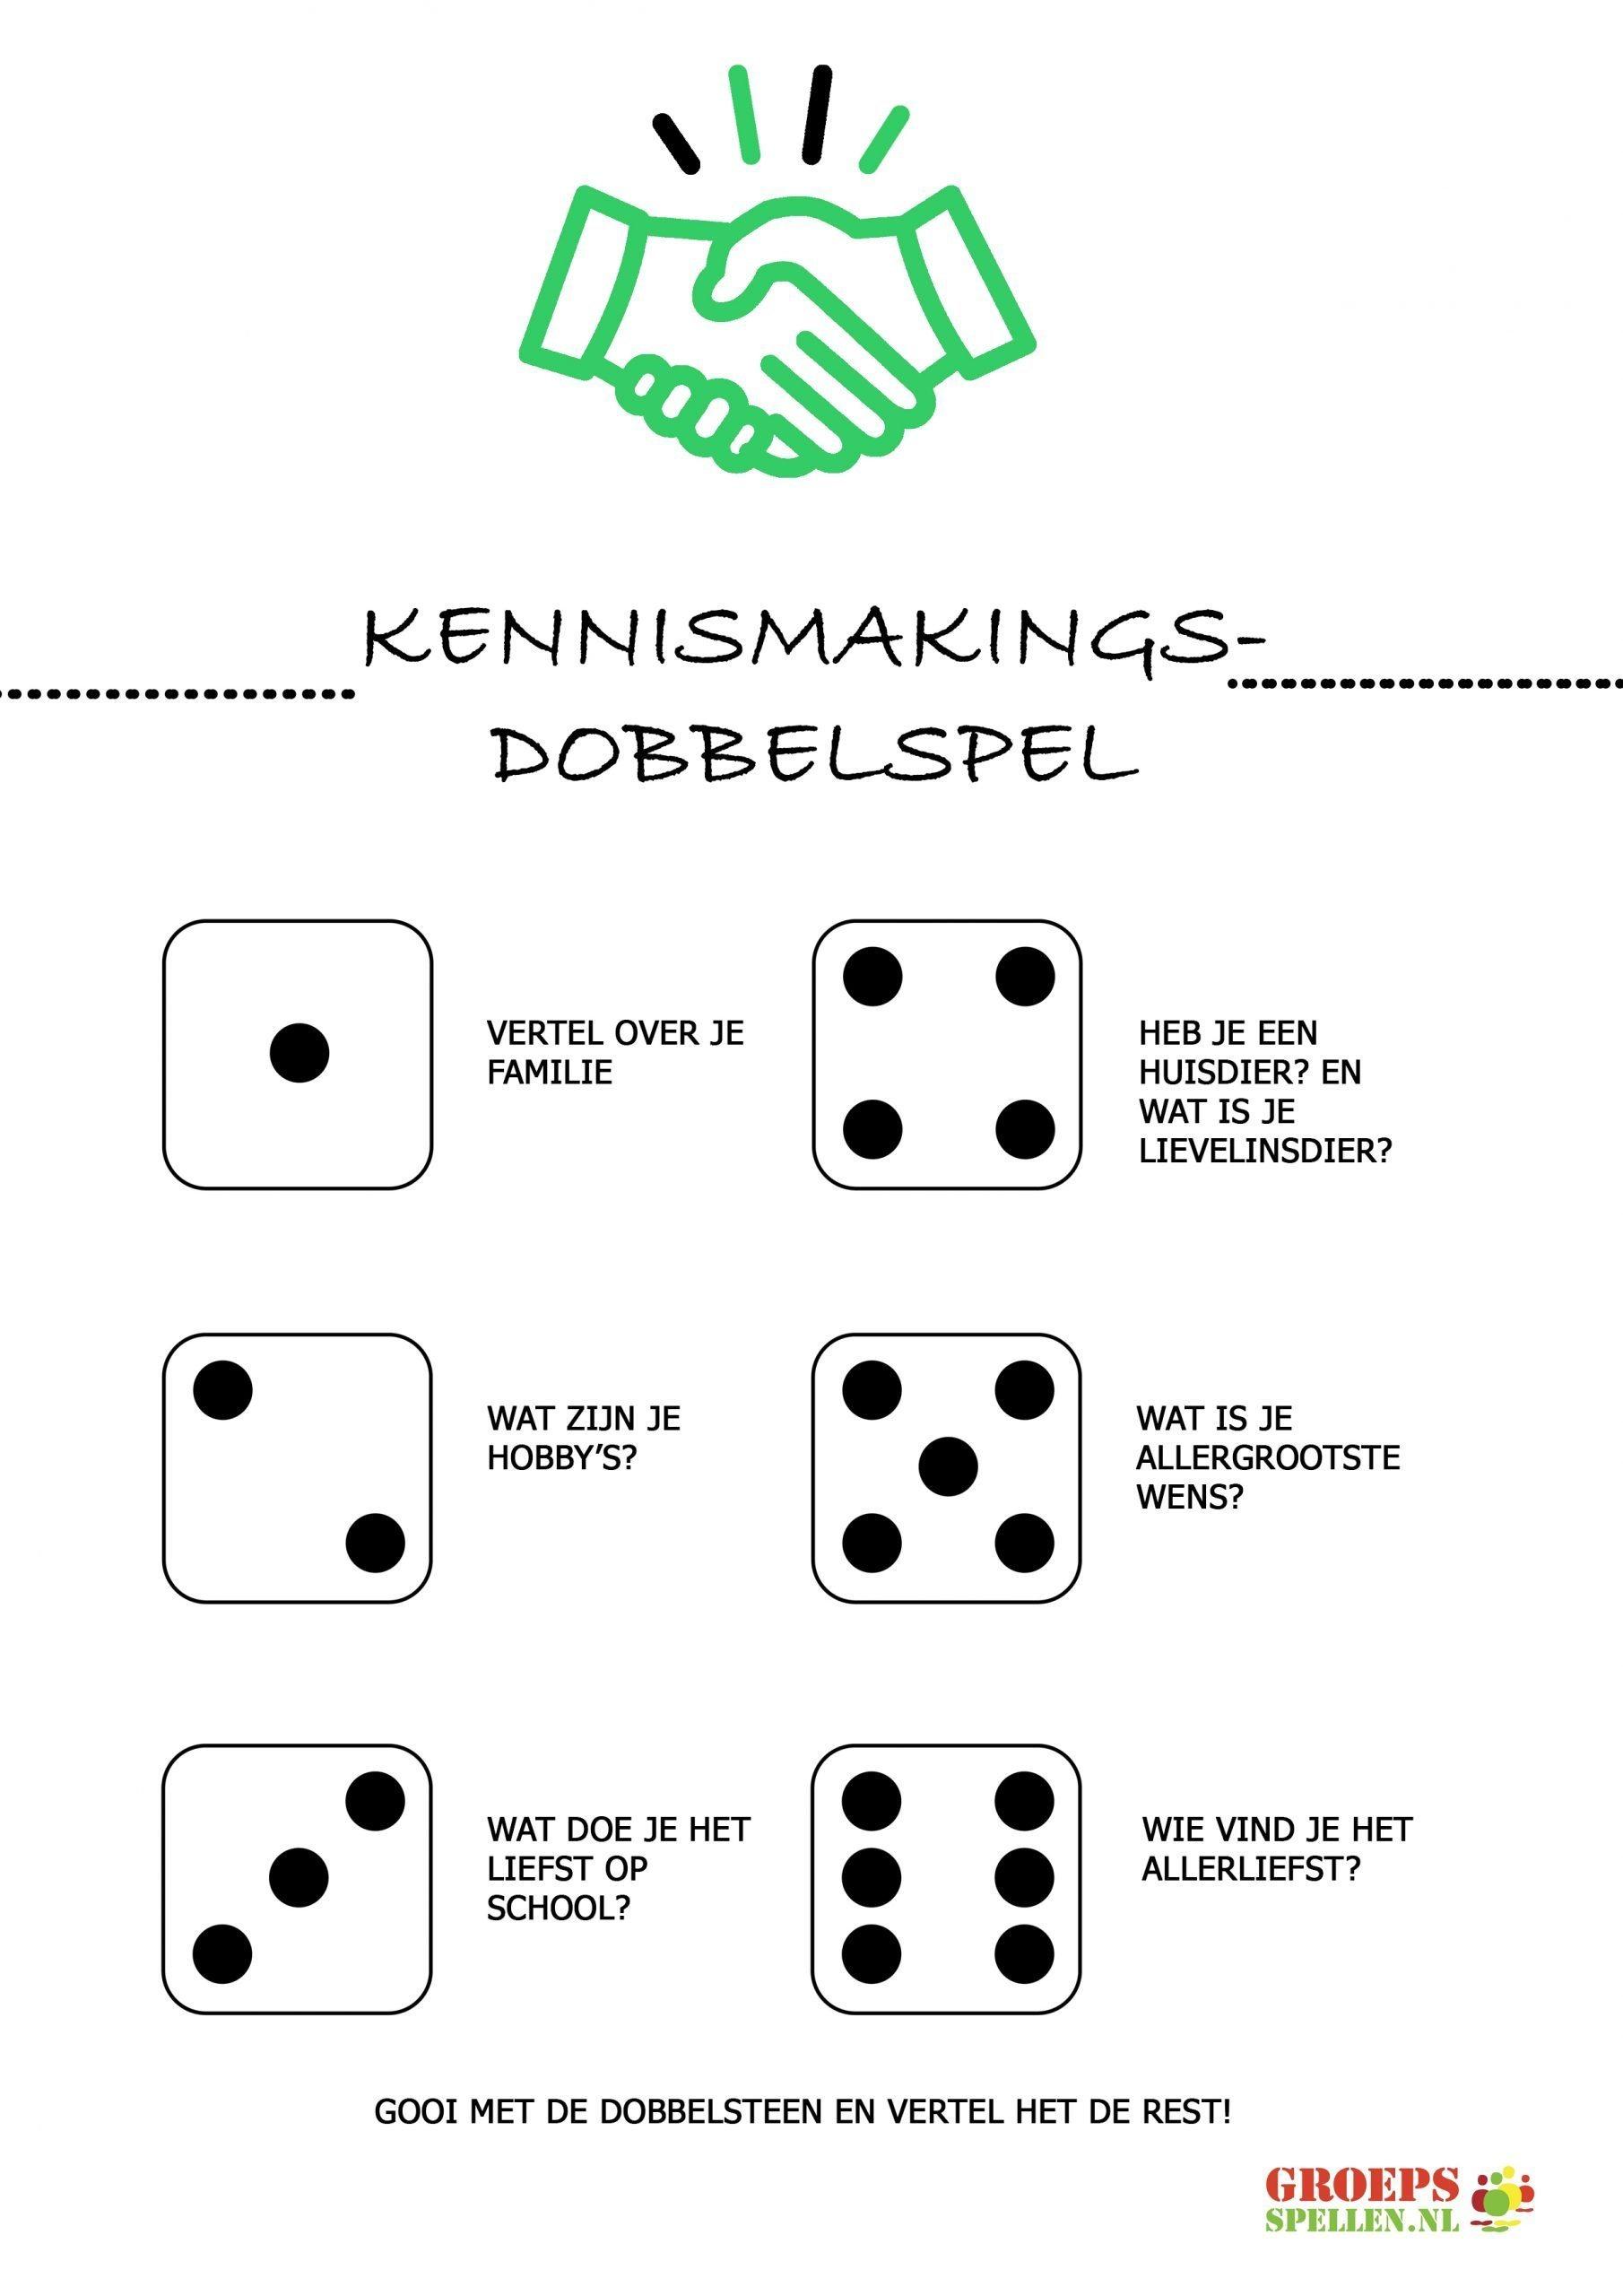 Kennismakings dobbelspel